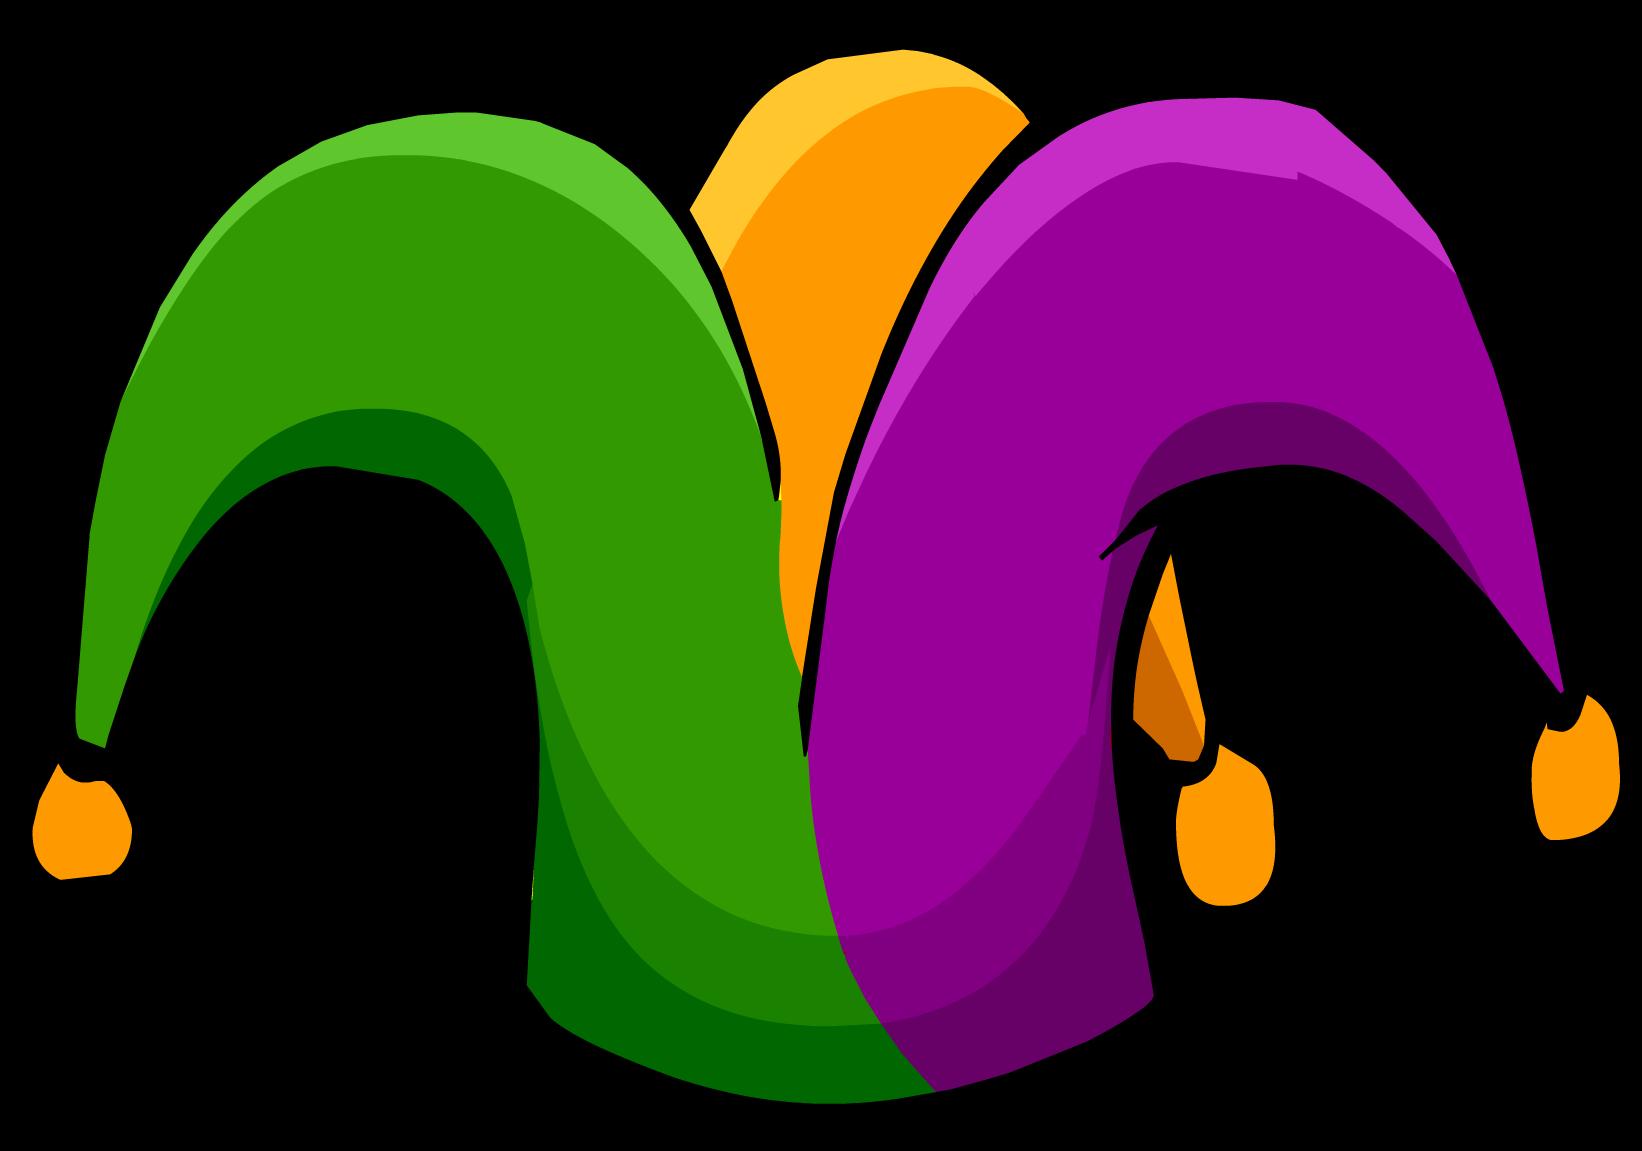 Joker cap clipart vector transparent download Court Jester Hat | Club Penguin Wiki | Fandom powered by Wikia vector transparent download